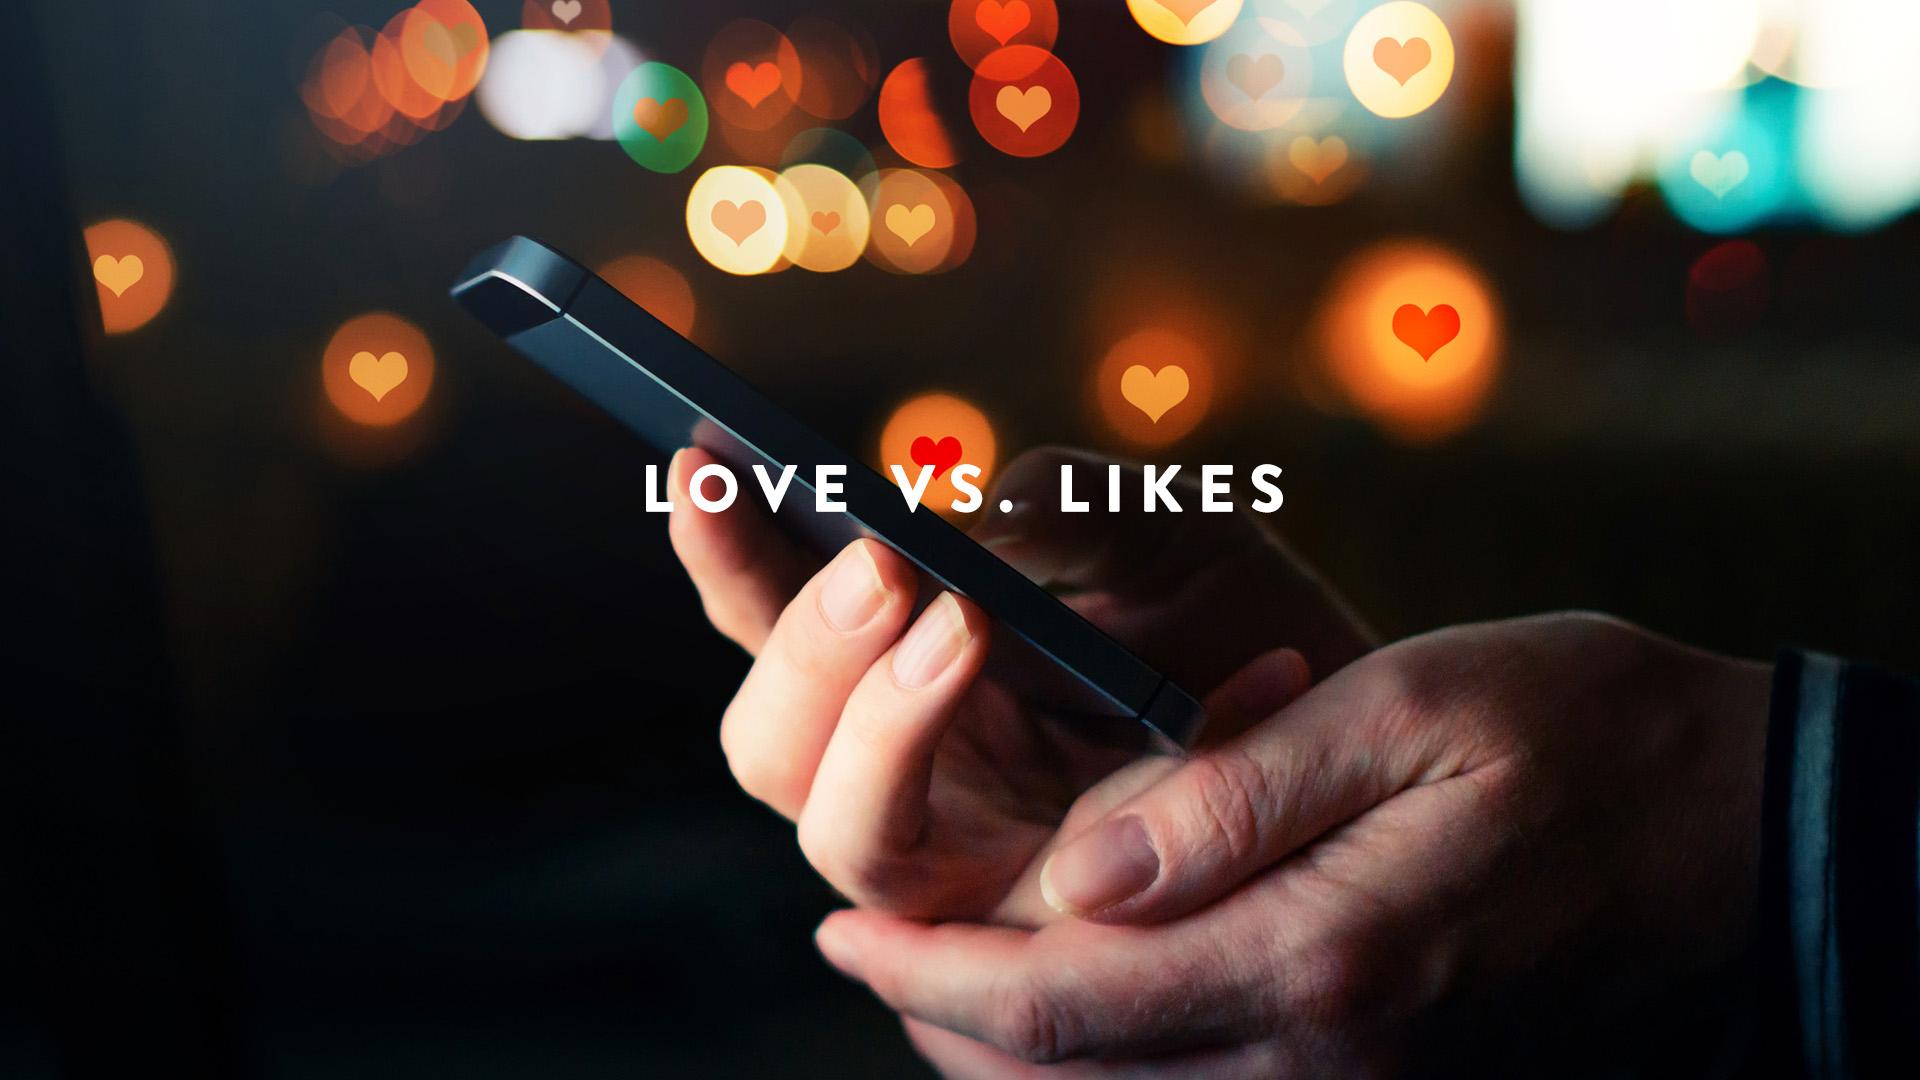 Love vs likes the dilemma of social media